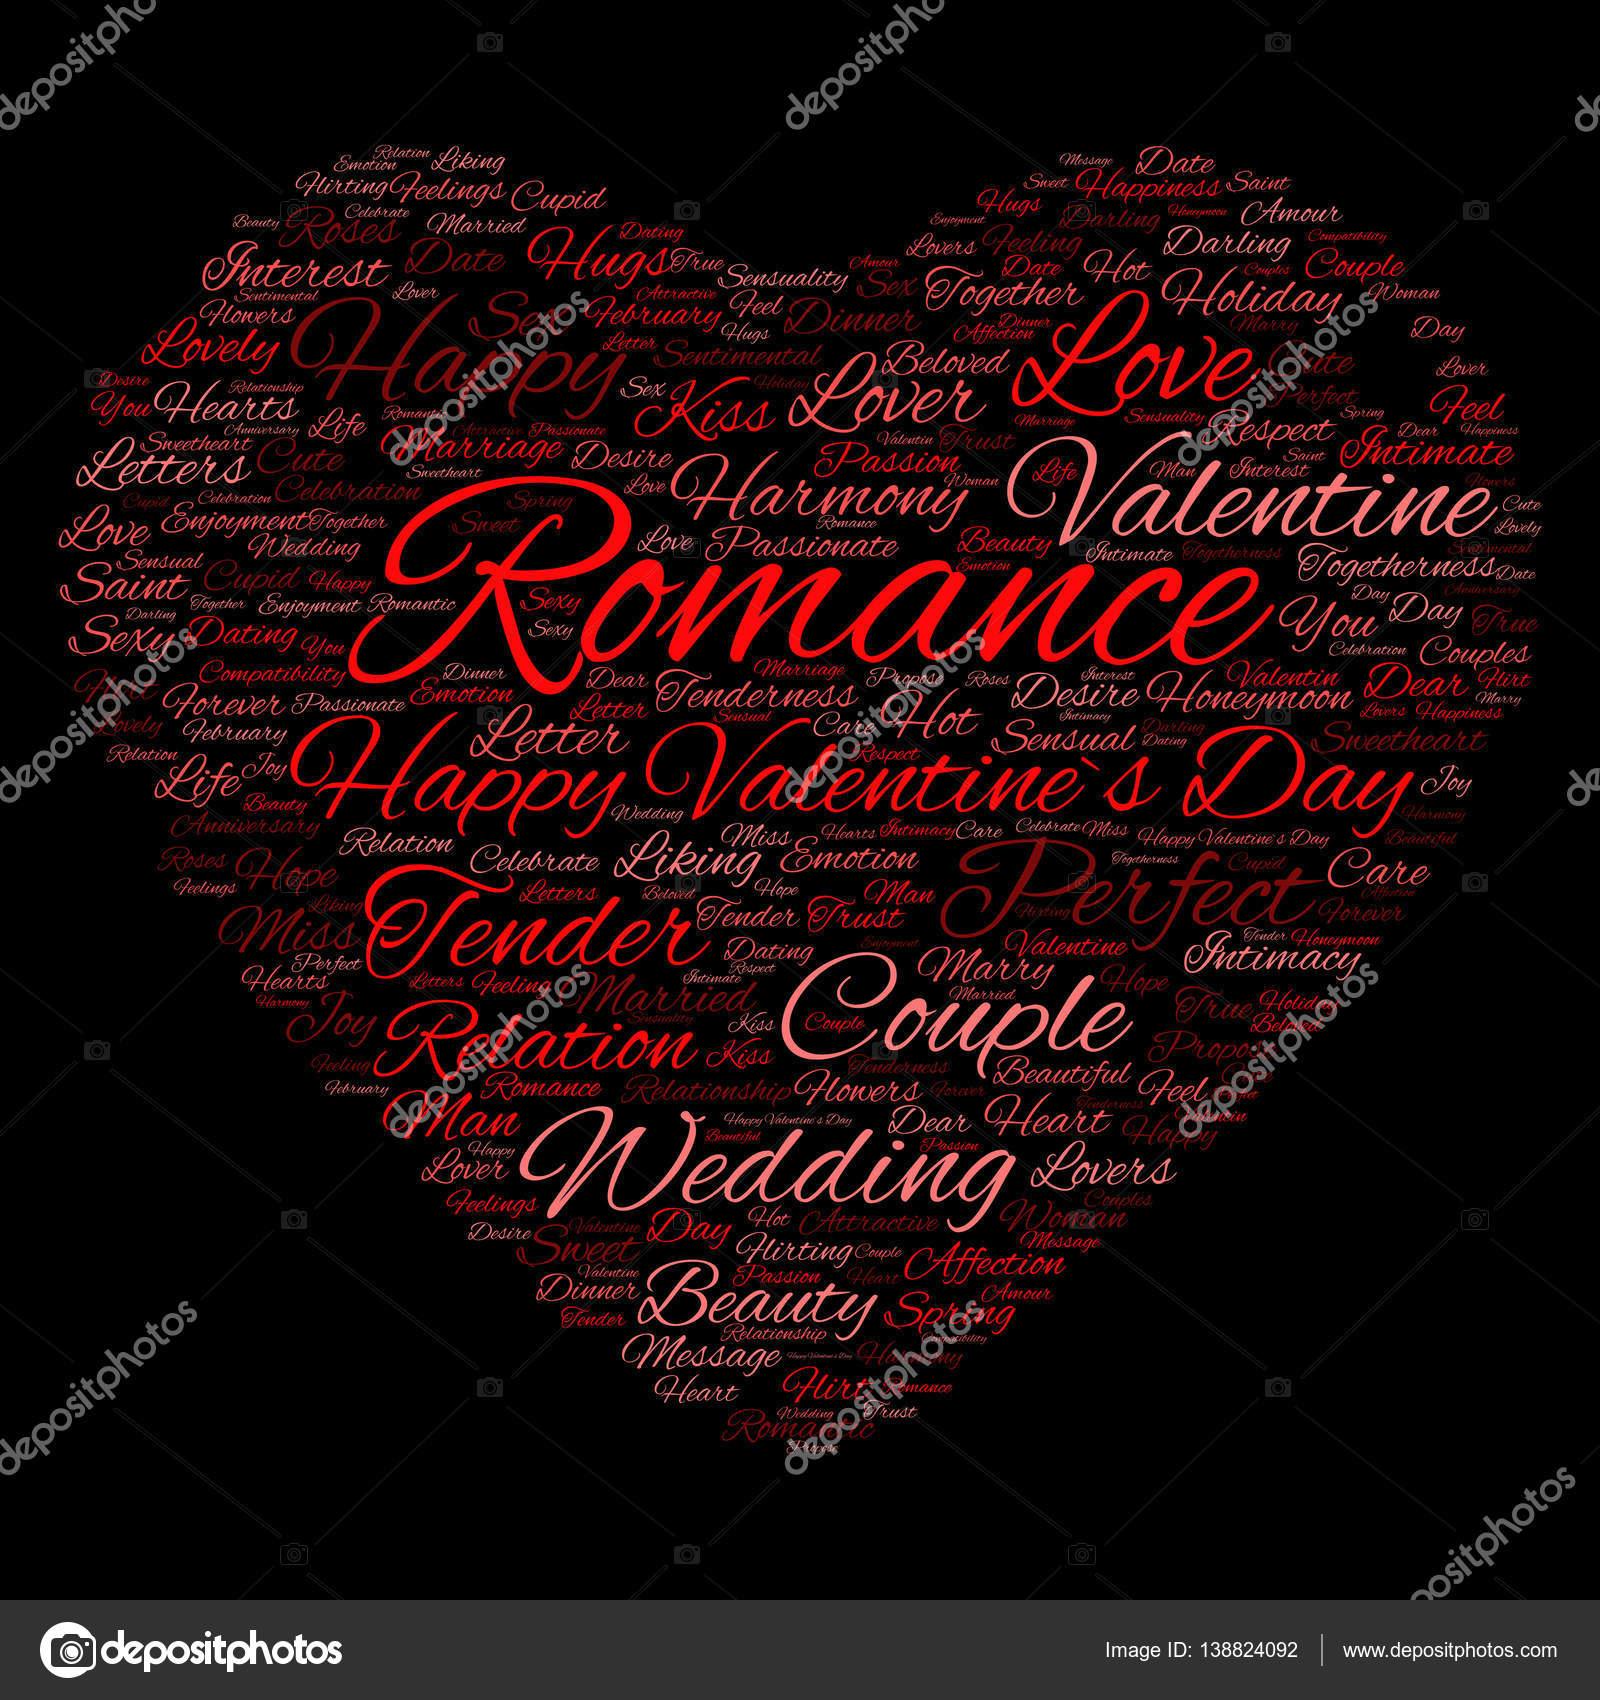 Heart Symbol With Hand Prints Stock Photo Design36 138824092